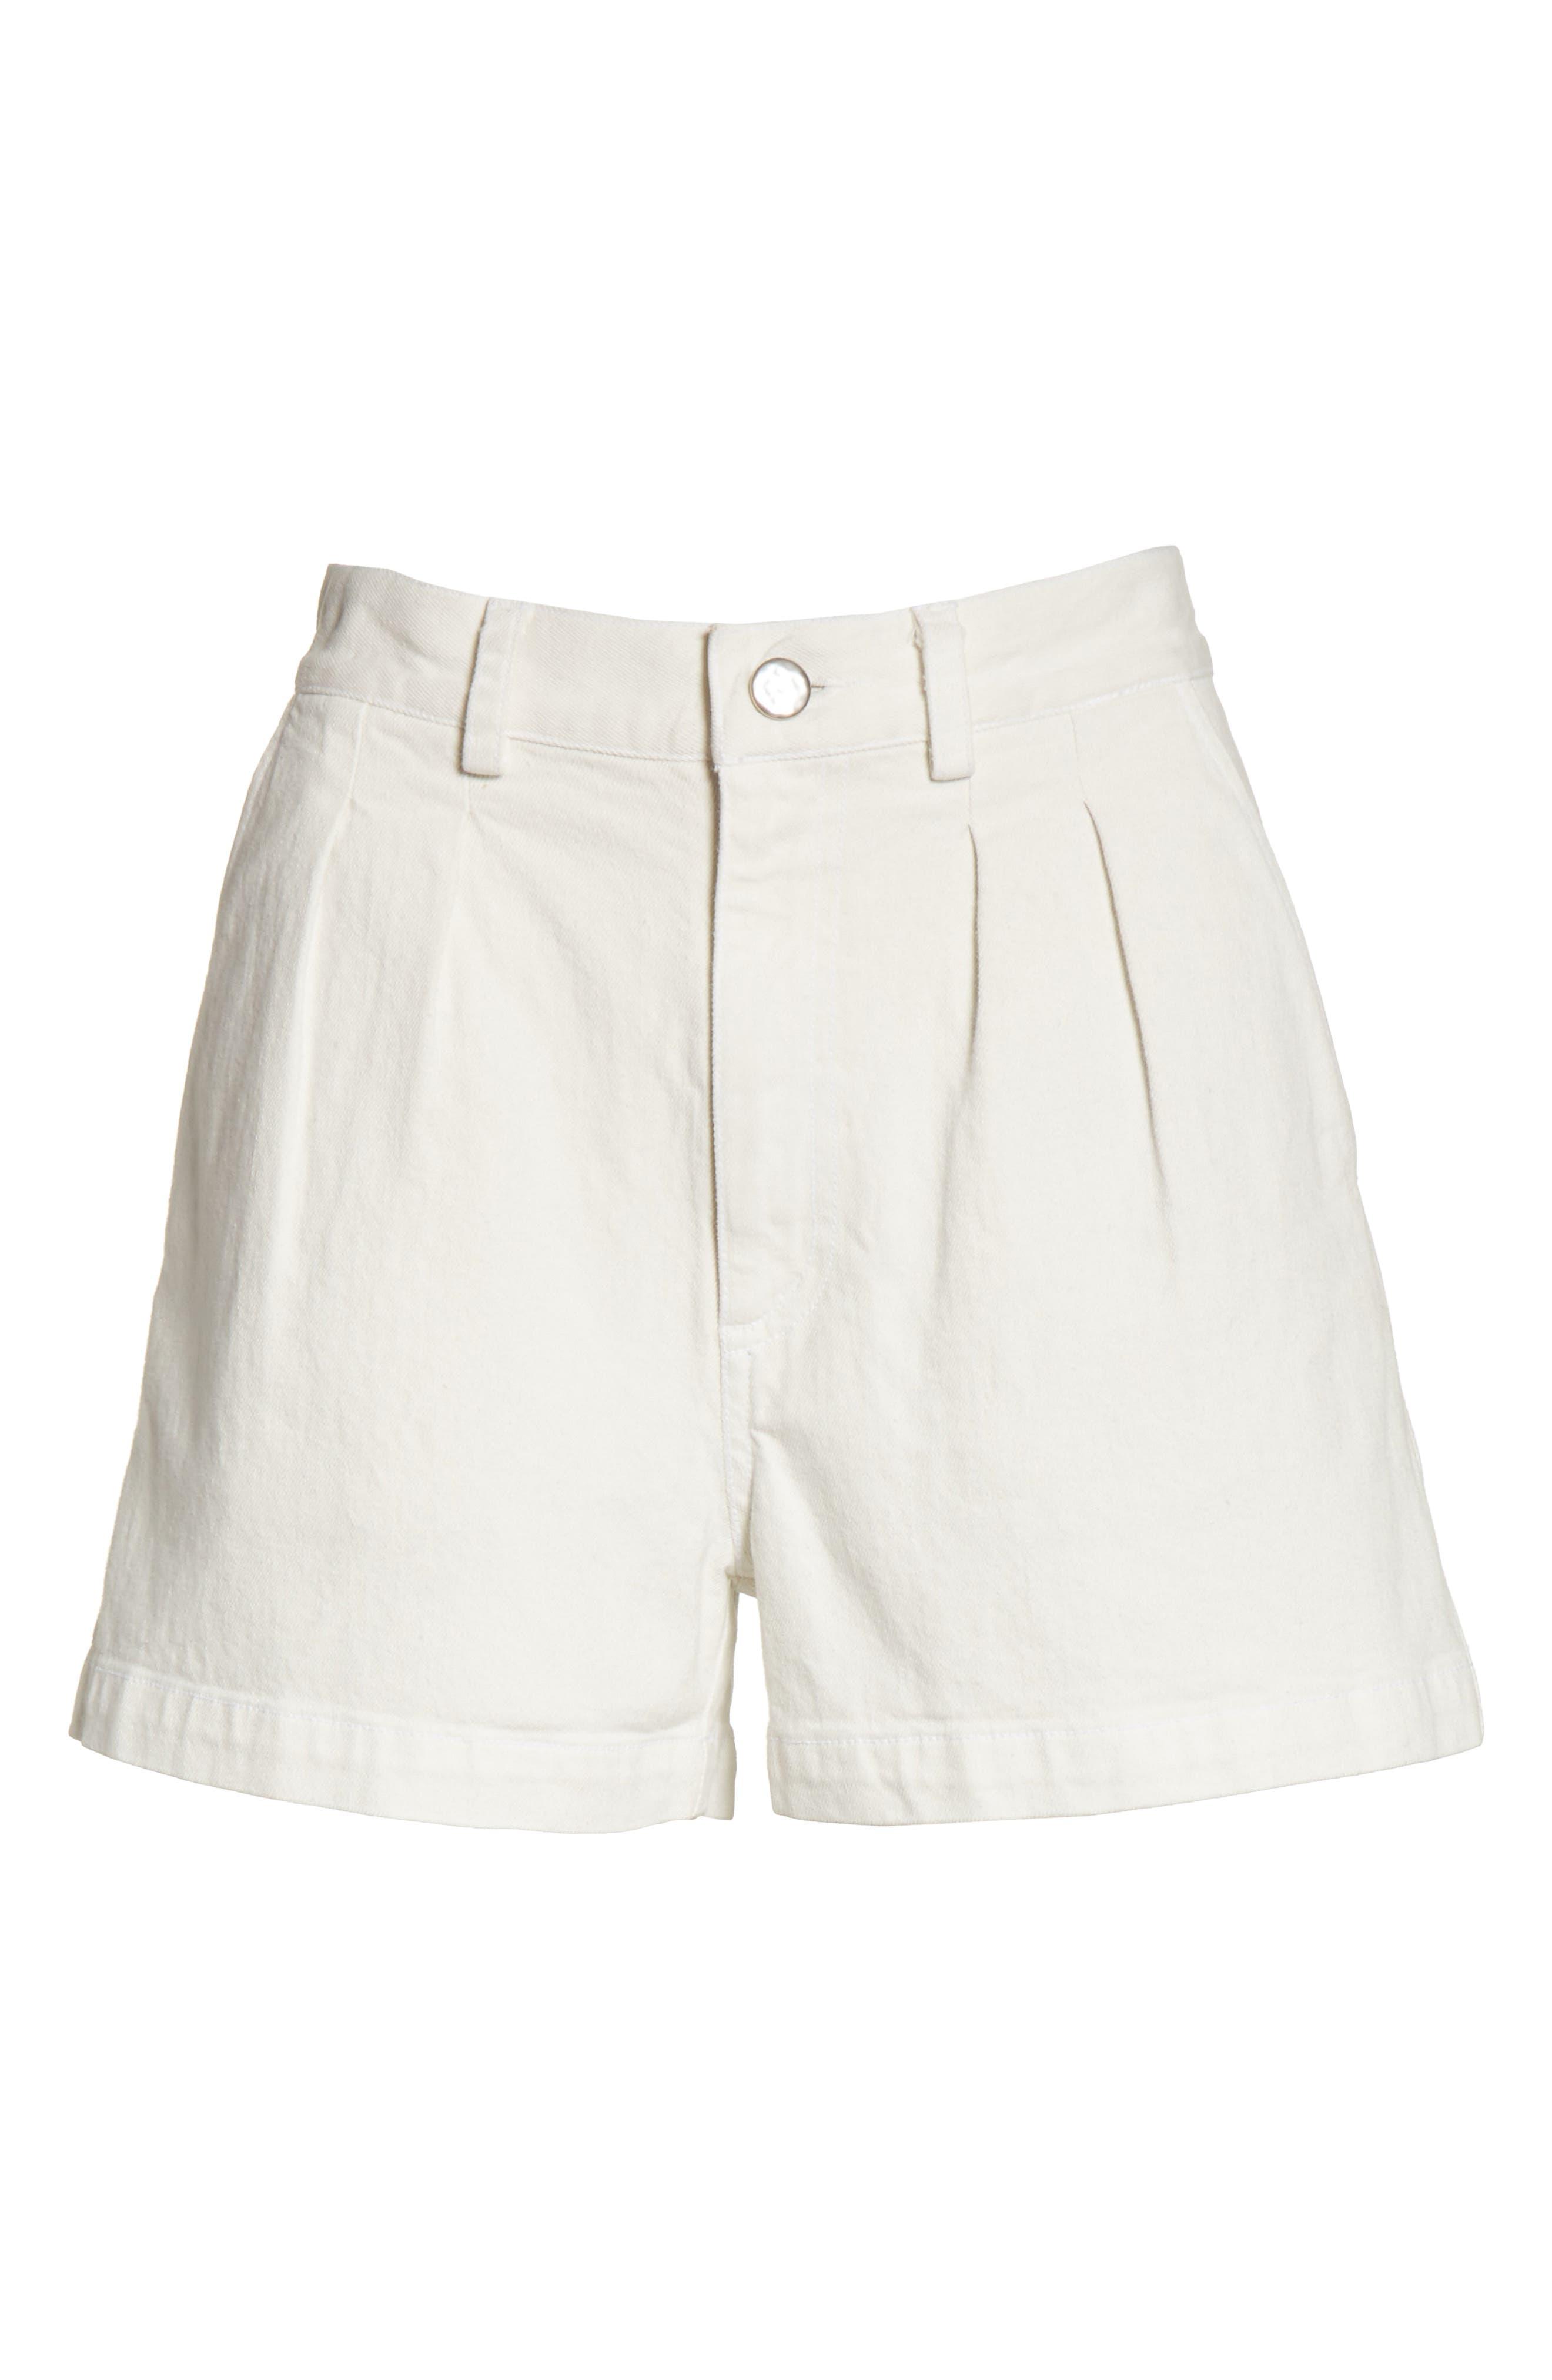 Daft Denim Shorts,                             Alternate thumbnail 6, color,                             198